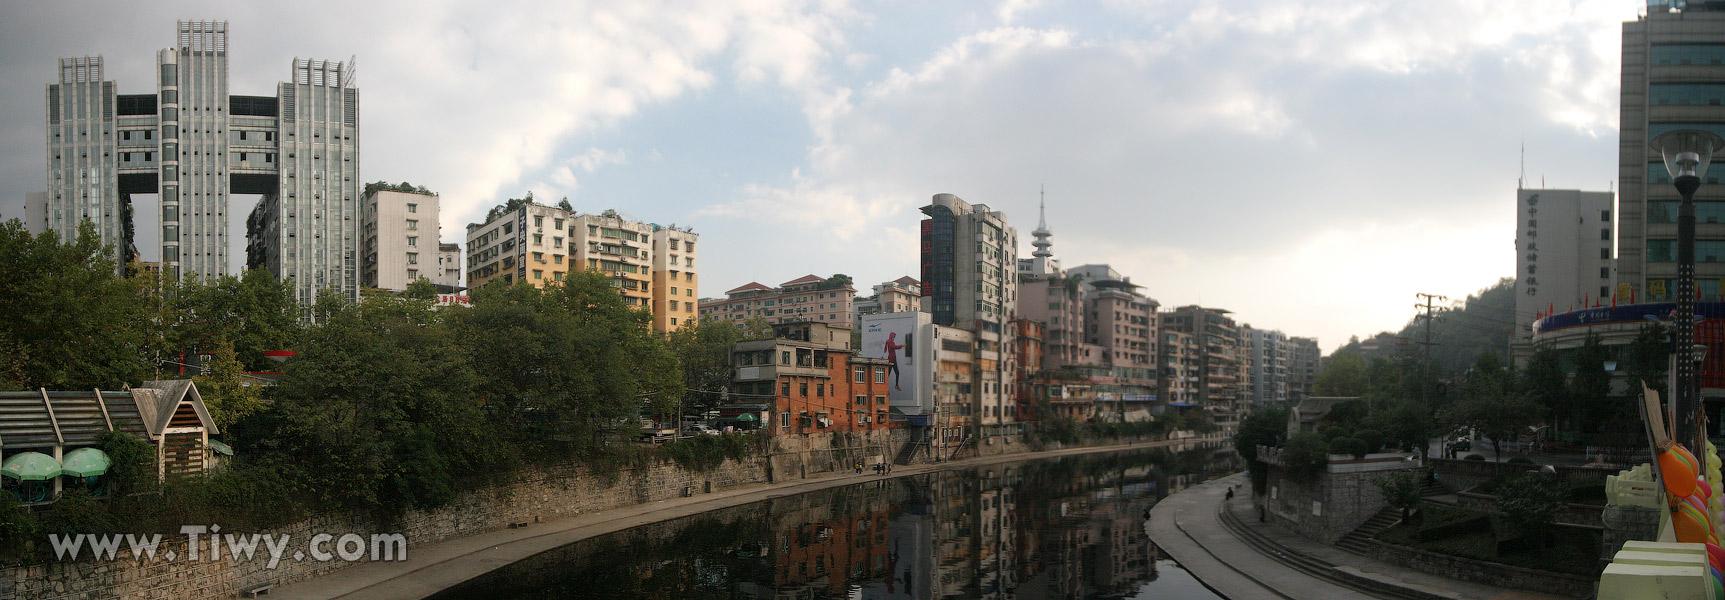 Zunyi China  city pictures gallery : Zunyi, Guizhou Province 2011 Travel to the Southwest China